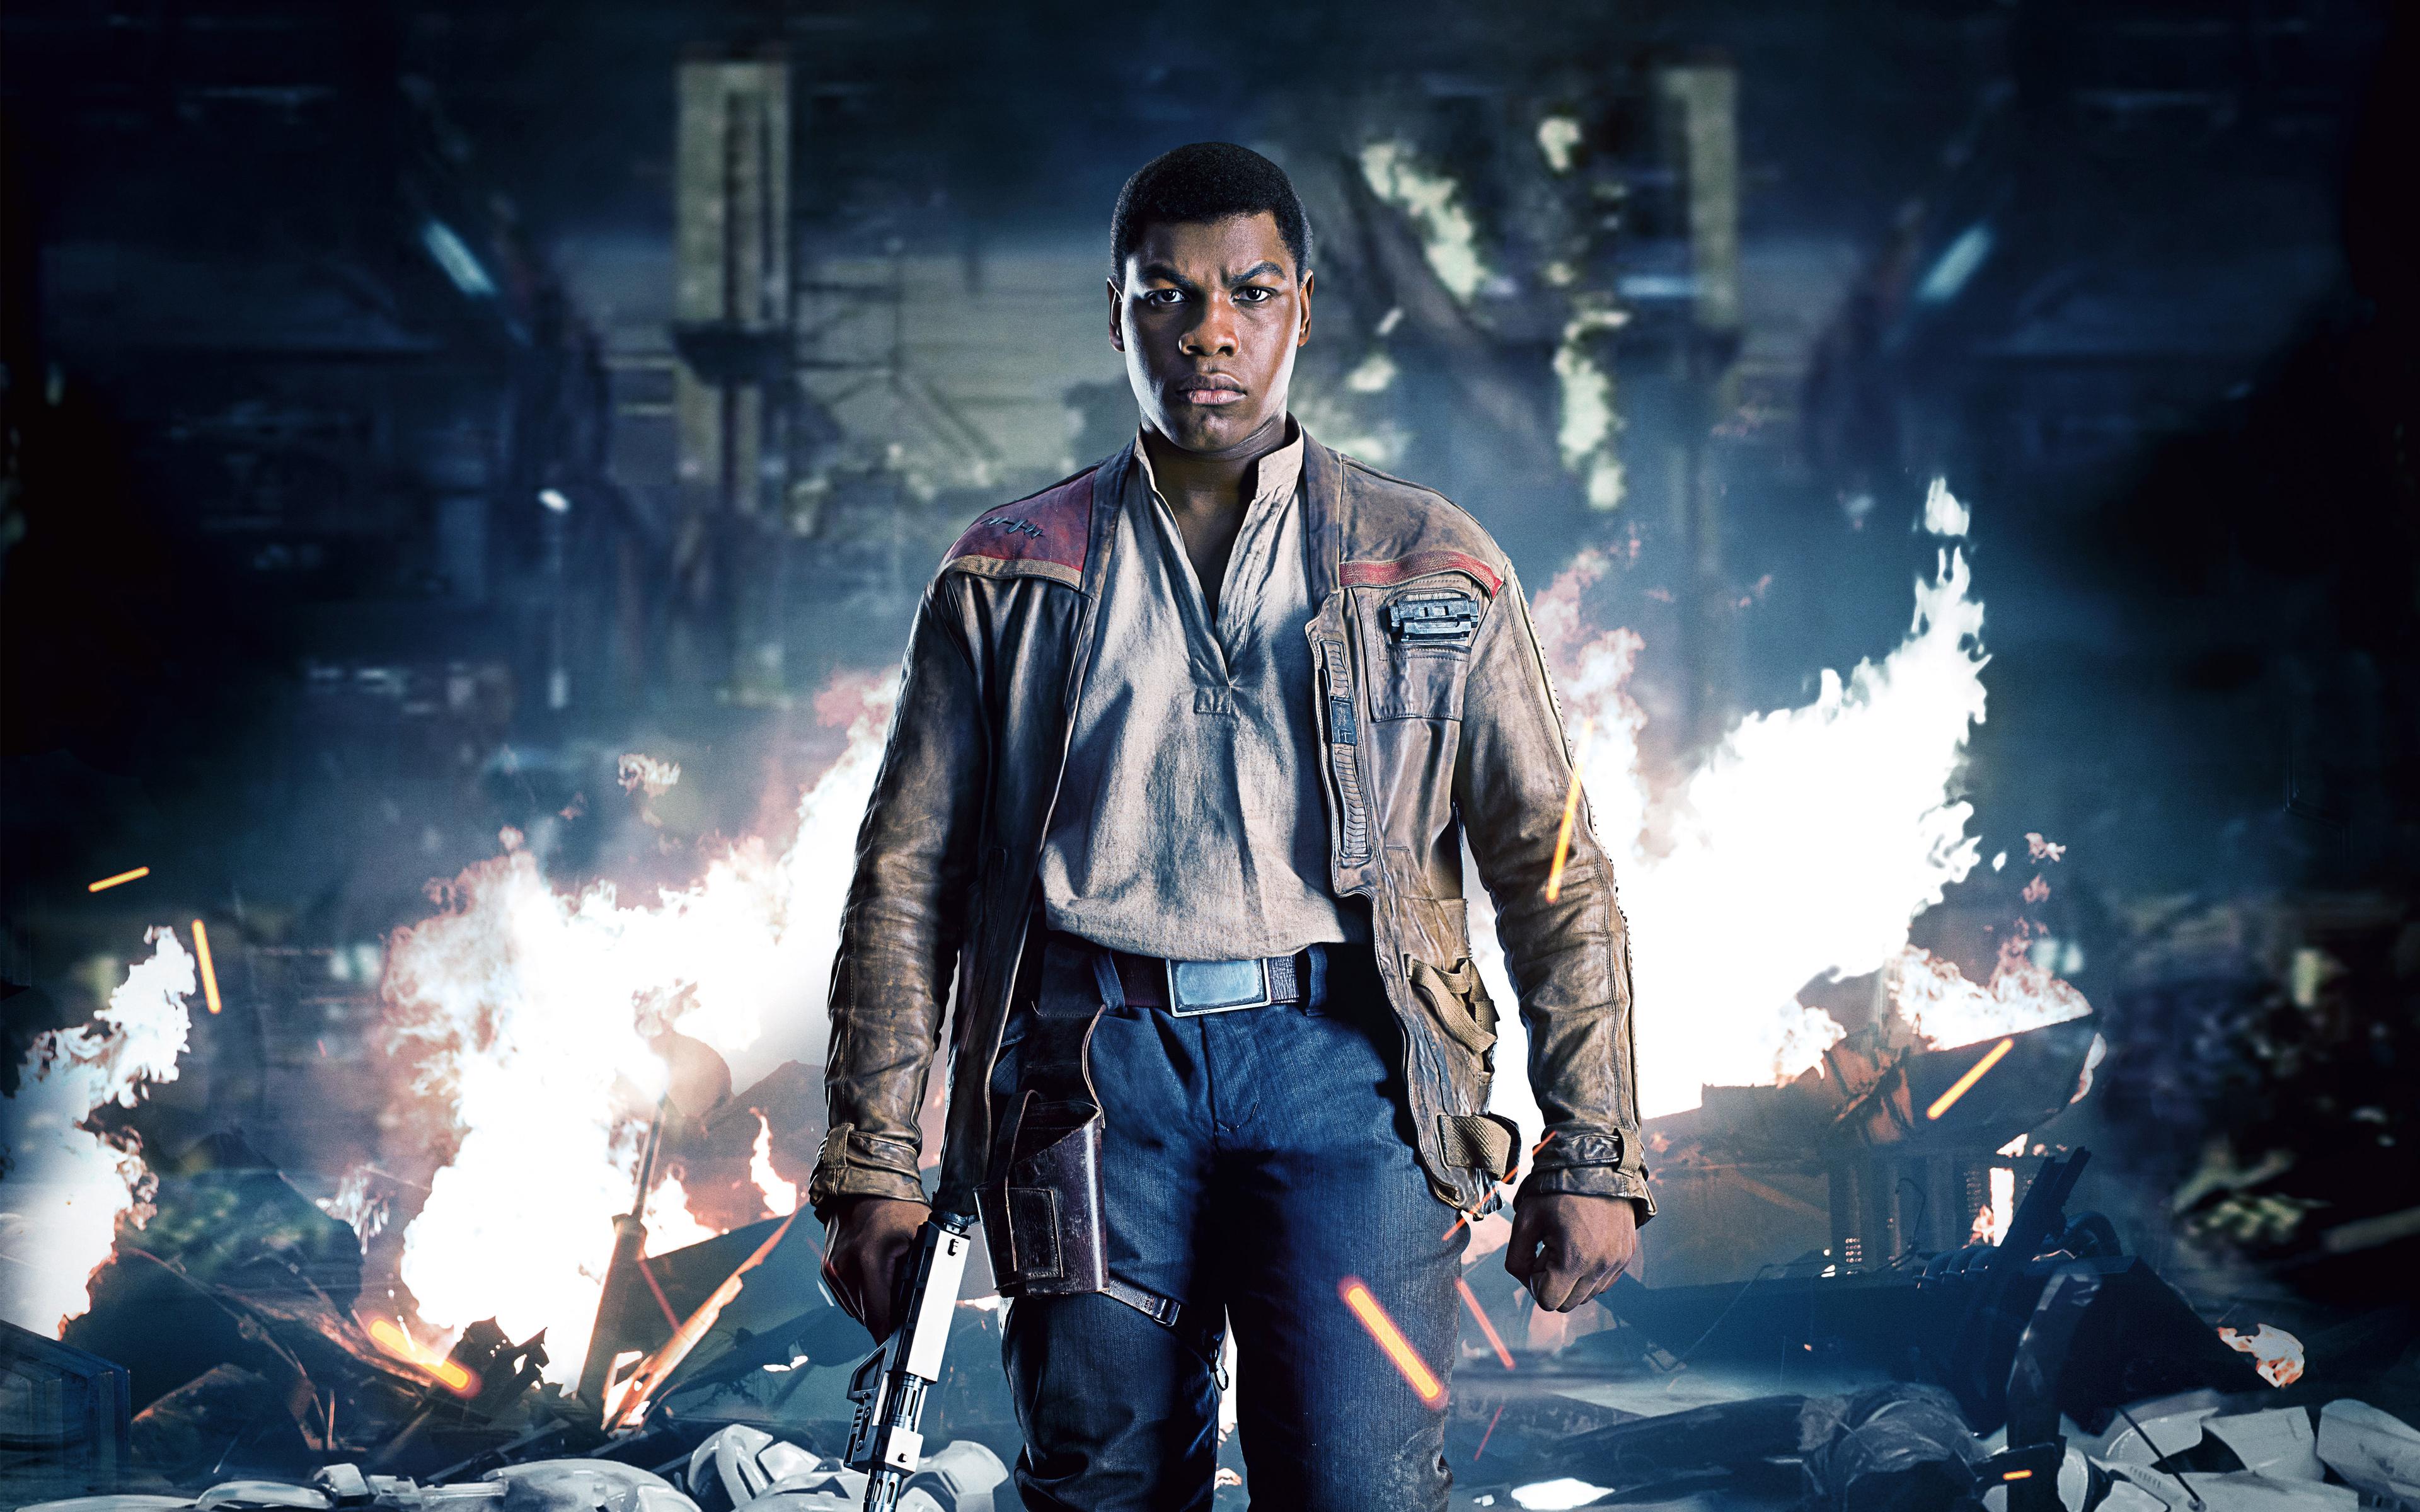 John Boyega As Finn Star Wars The Last Jedi 4K